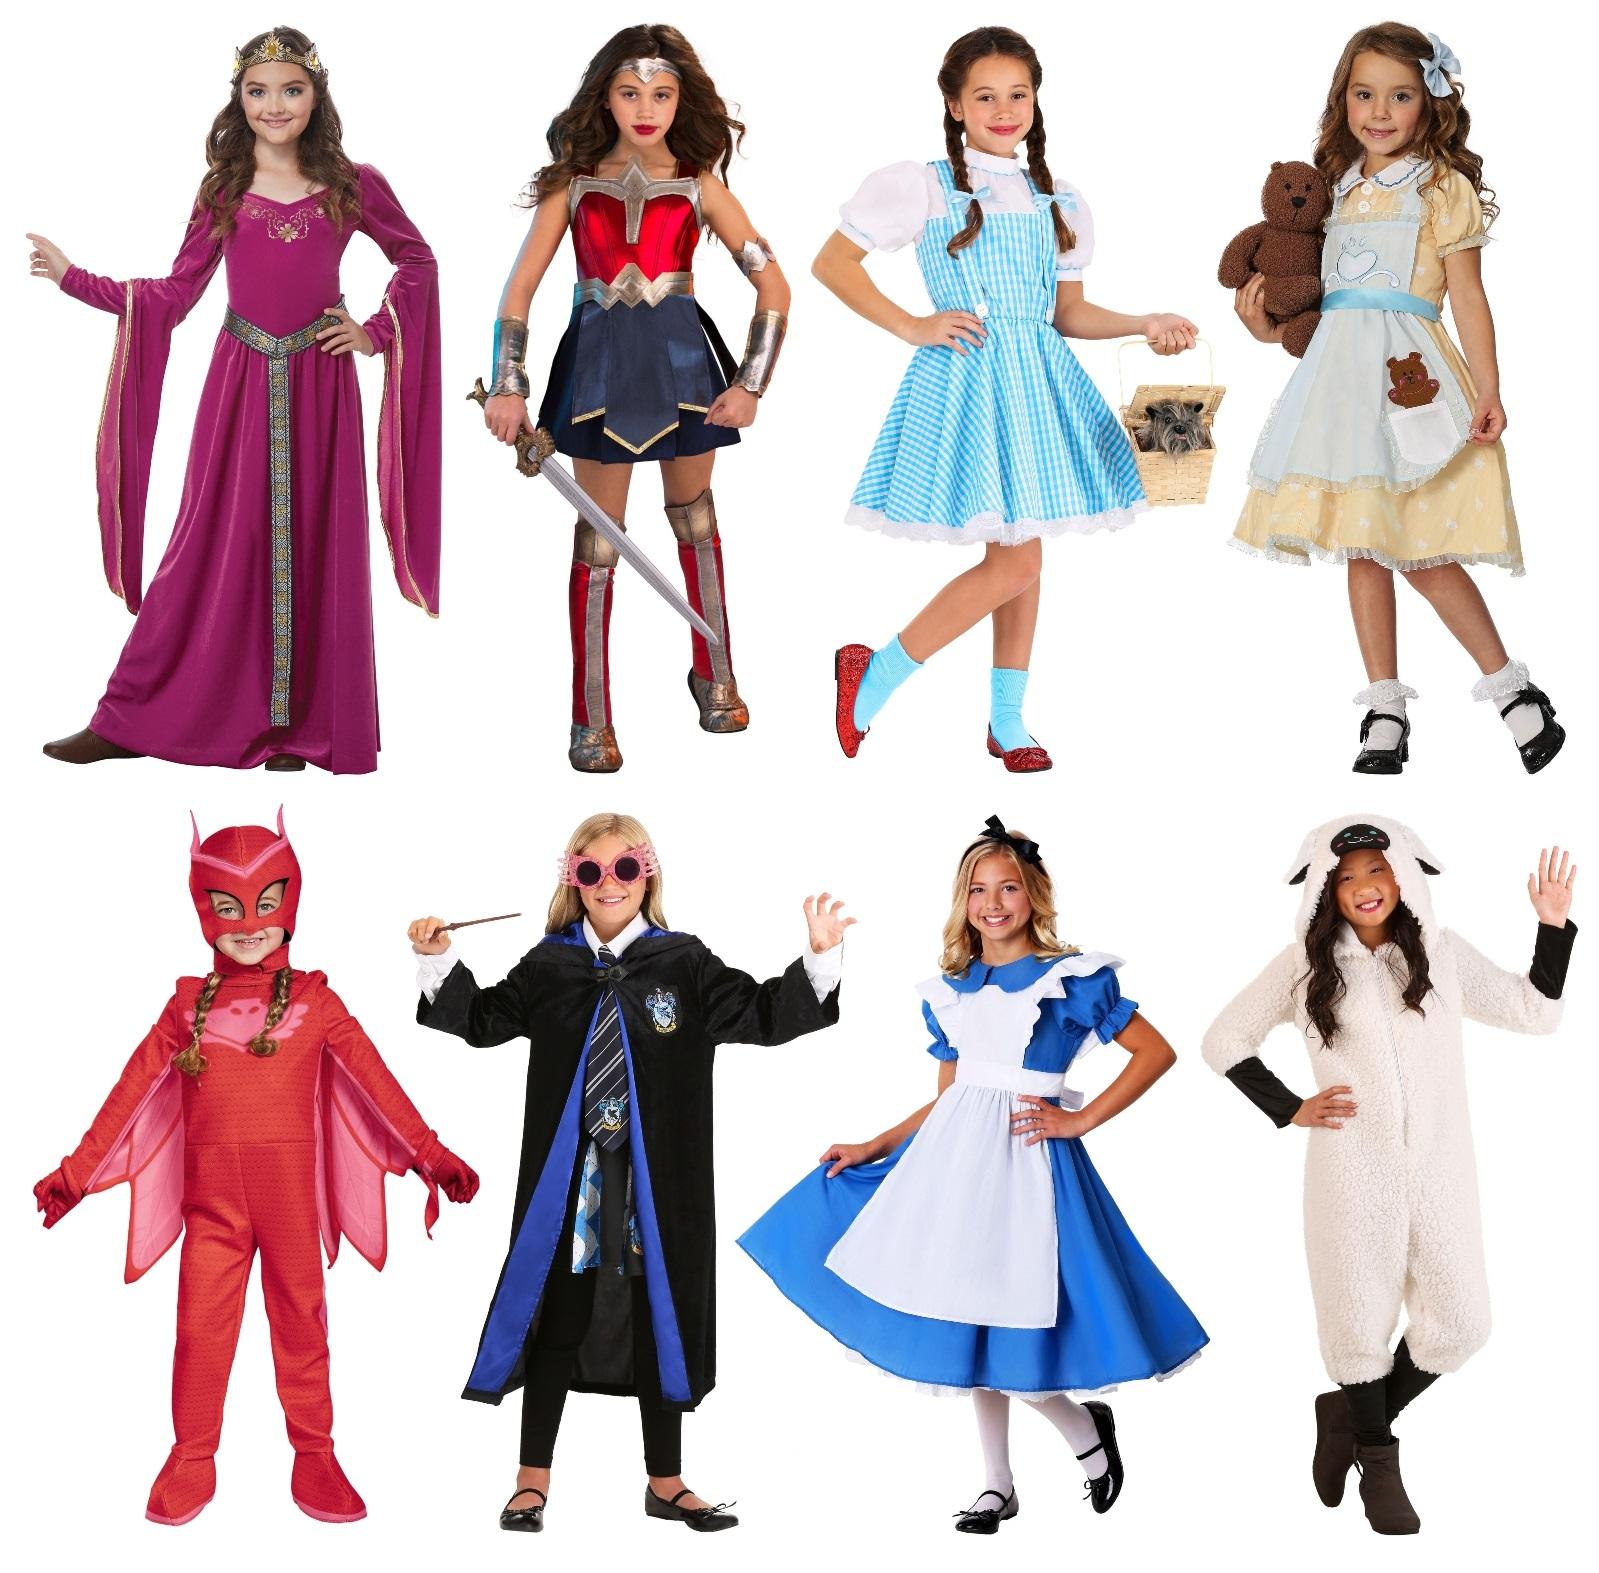 Girls' Purim Costume Ideas